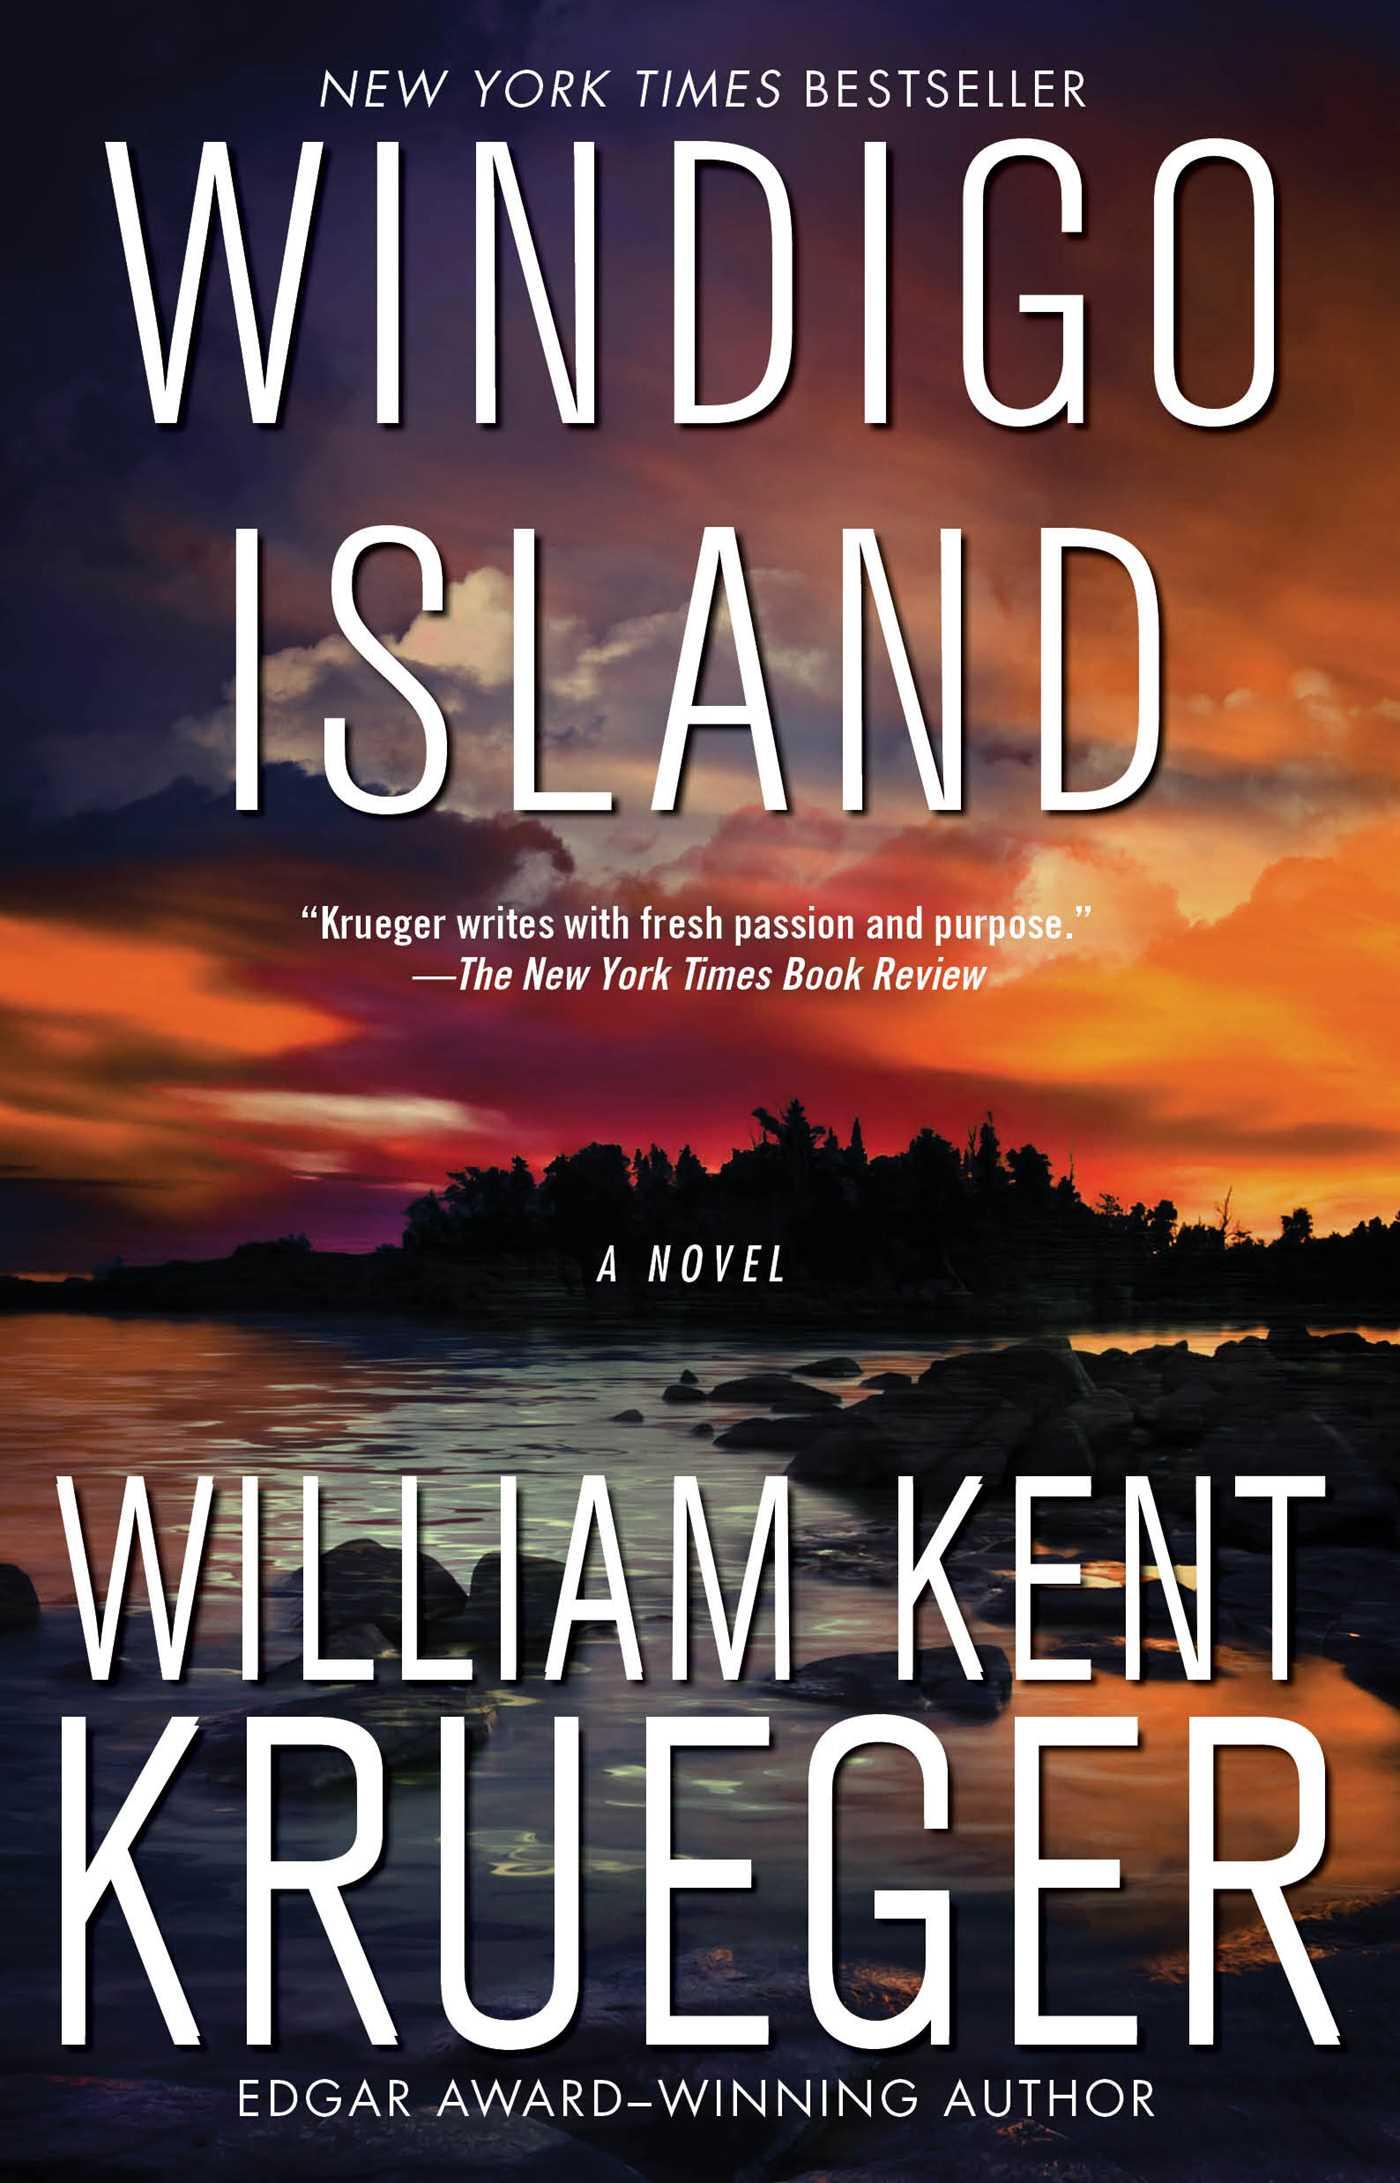 Windigo island 9781476749259 hr